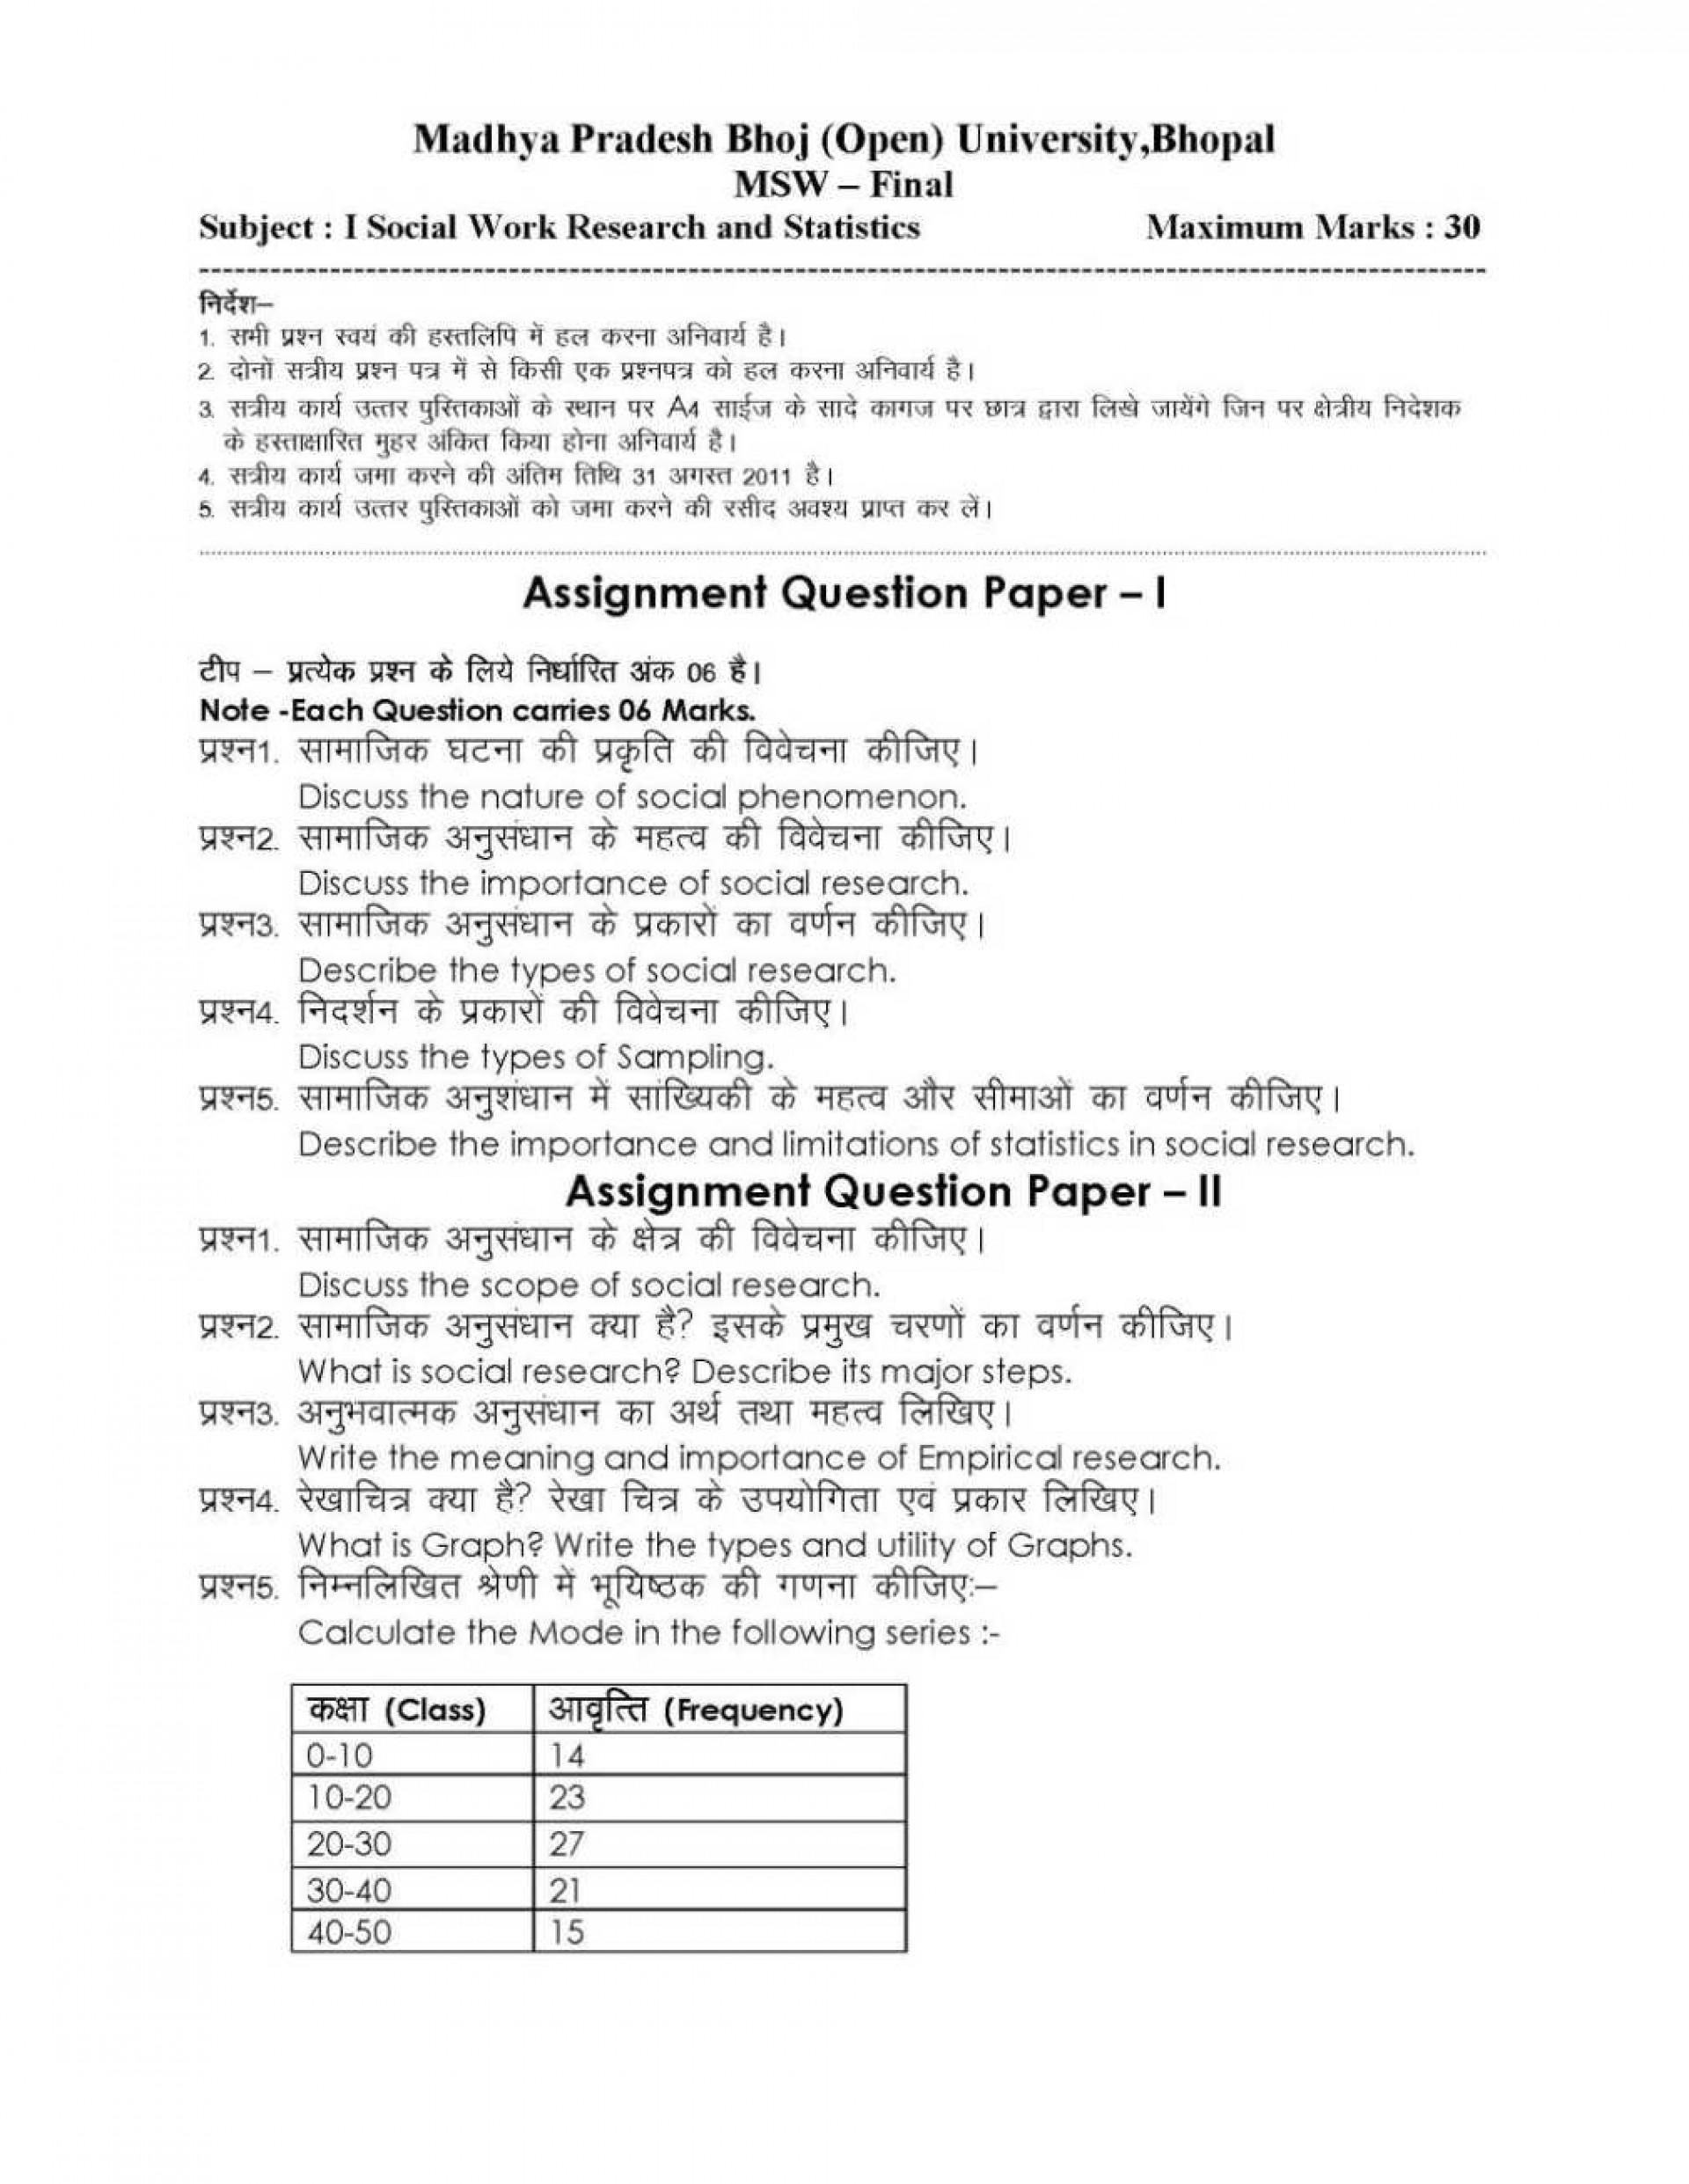 008 Essay Example Baseball Bhoj University Bhopal History Of The Short Sensational Game In Hindi On Language Topics 1920